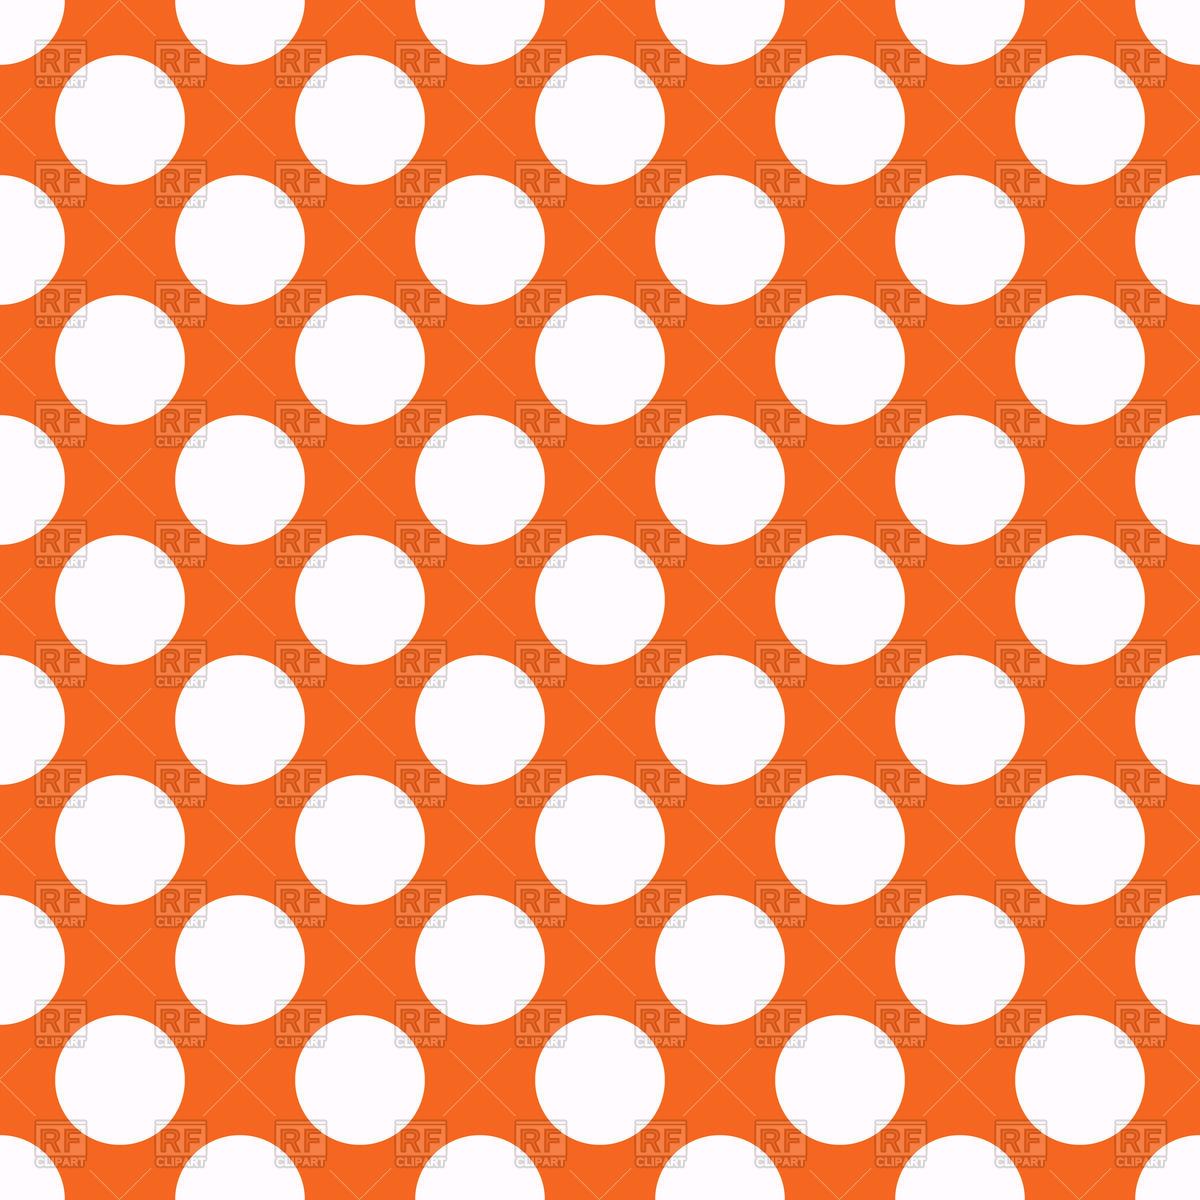 Orange seamless polka dot background Vector Image #42967.